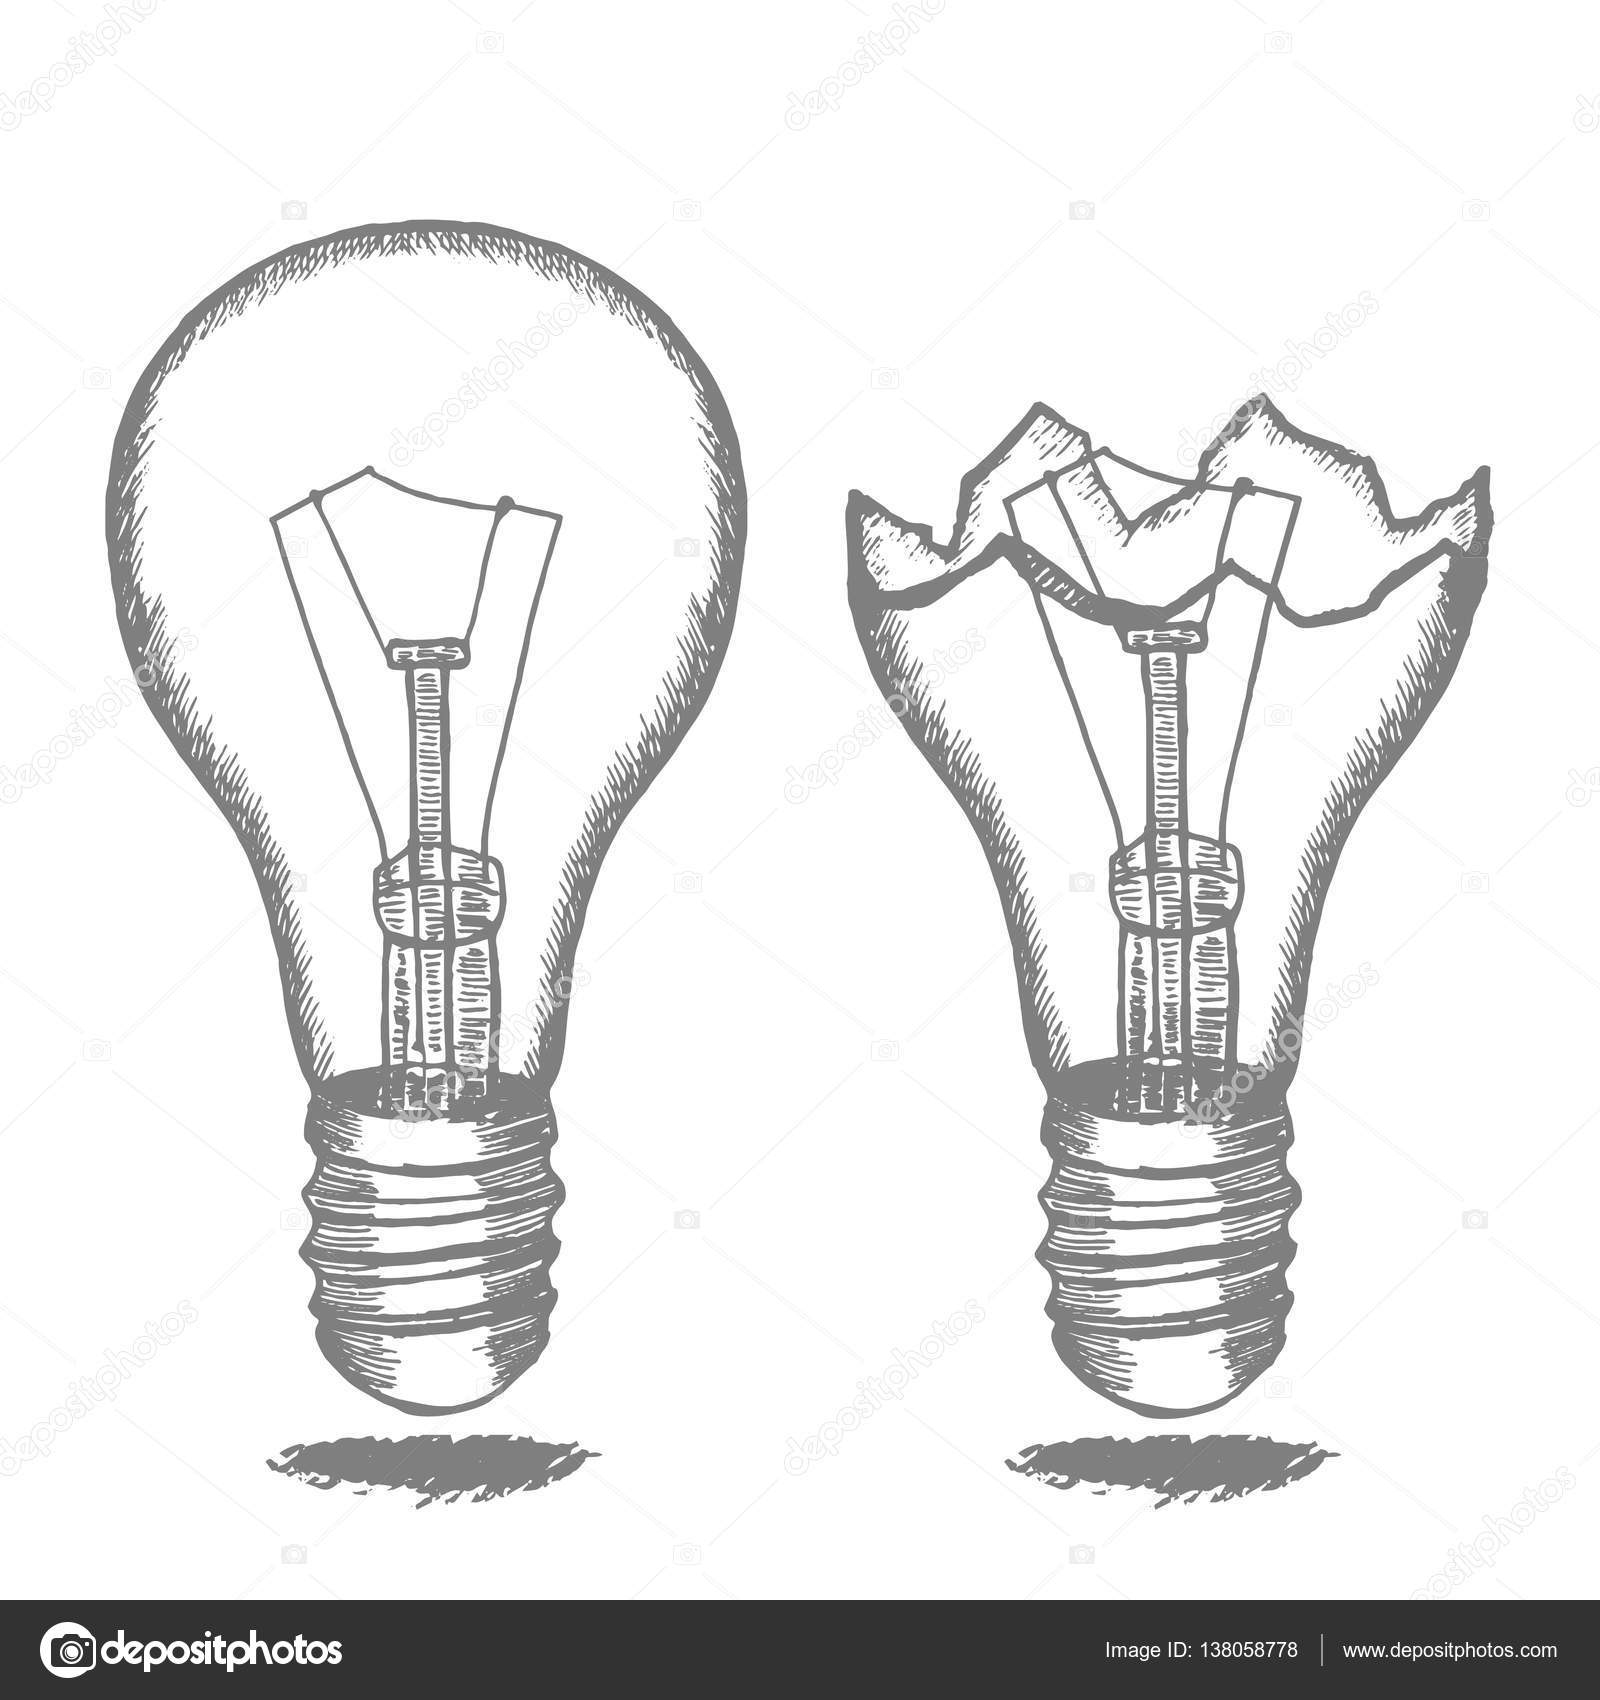 Lamp Bulb Hand Draw Sketch Vector Stock Vector C Bigmouse 138058778